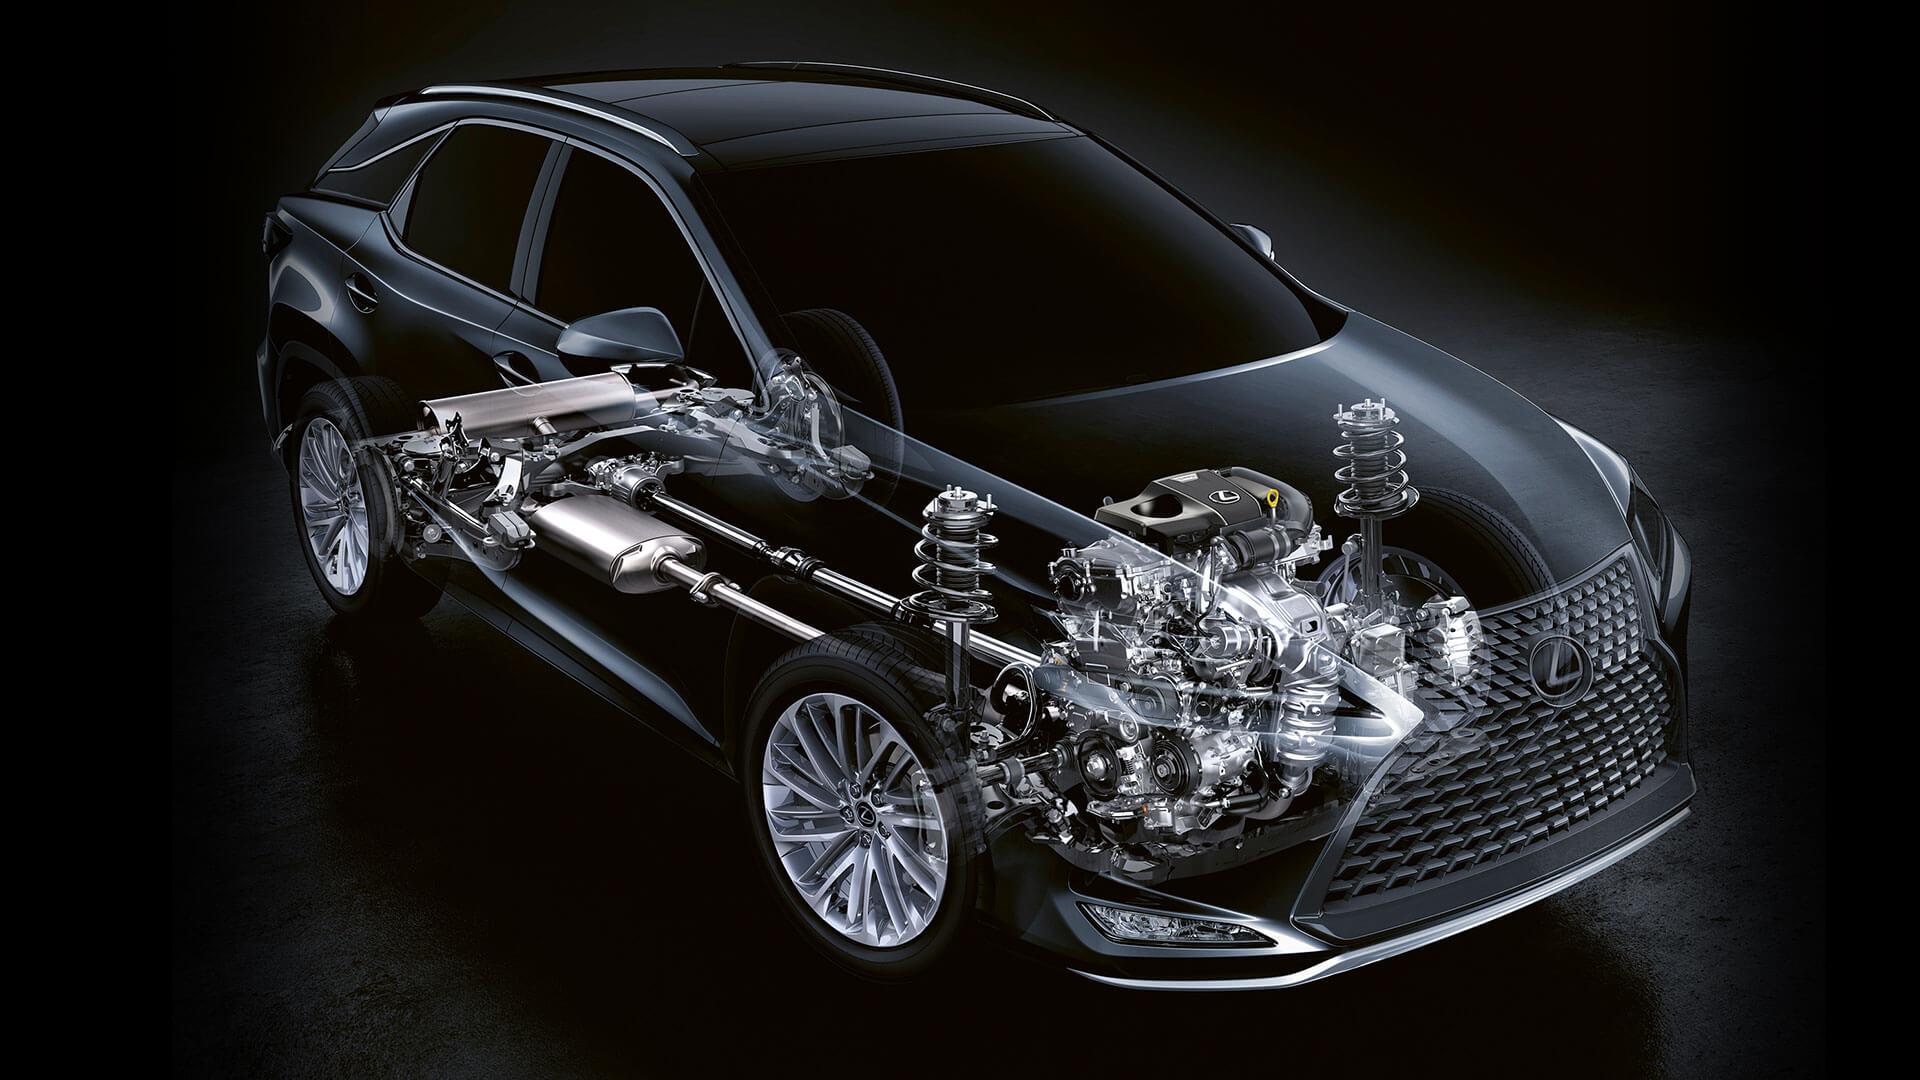 2019 lexus rxl hotspot petrol engine